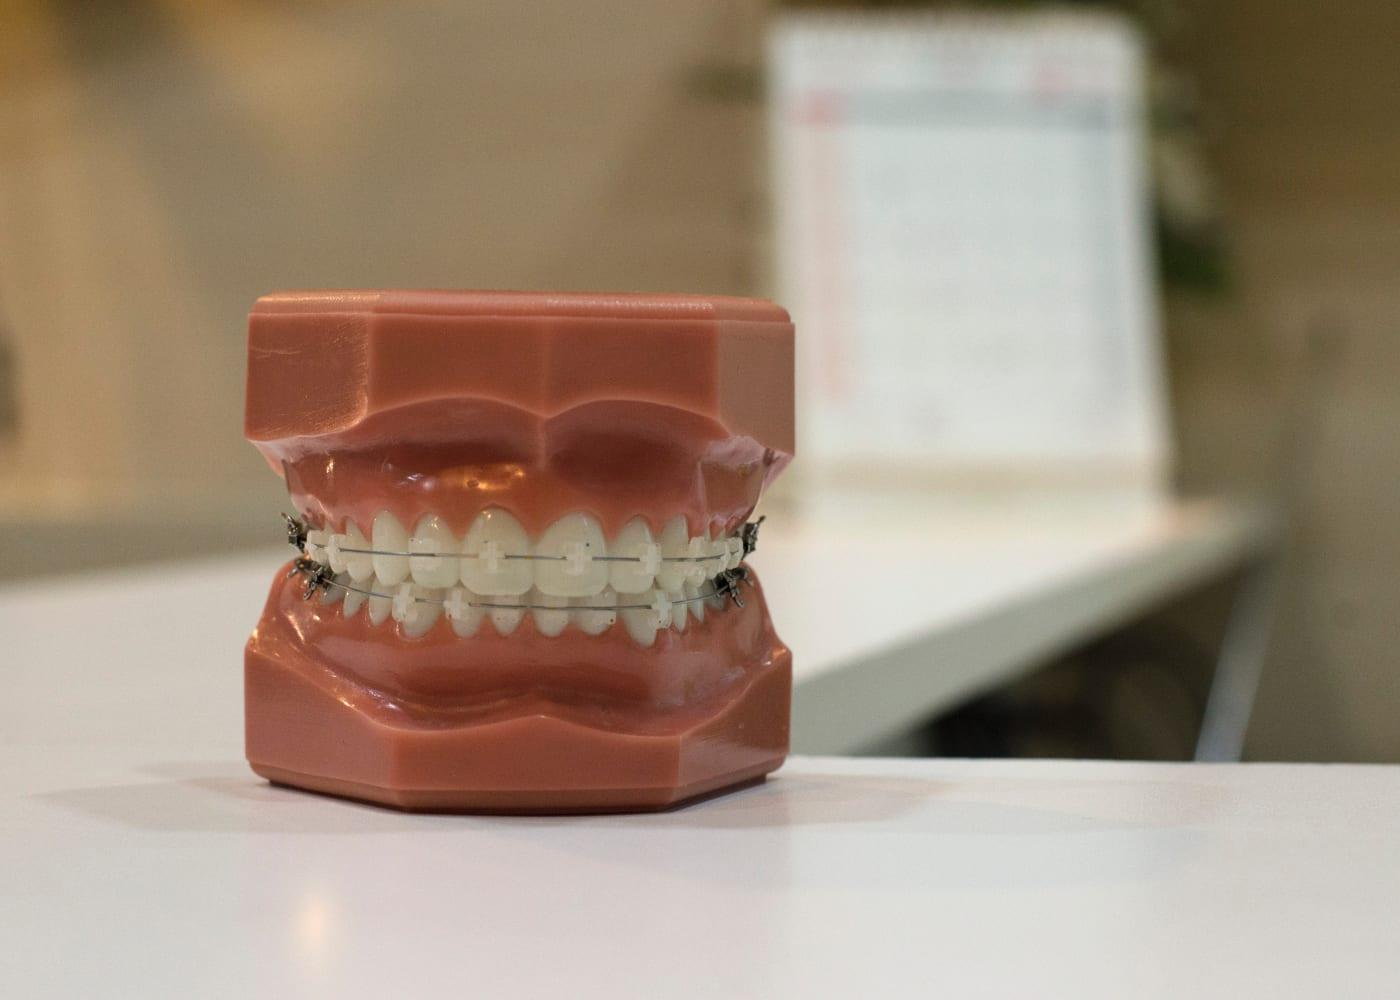 kids braces dental model